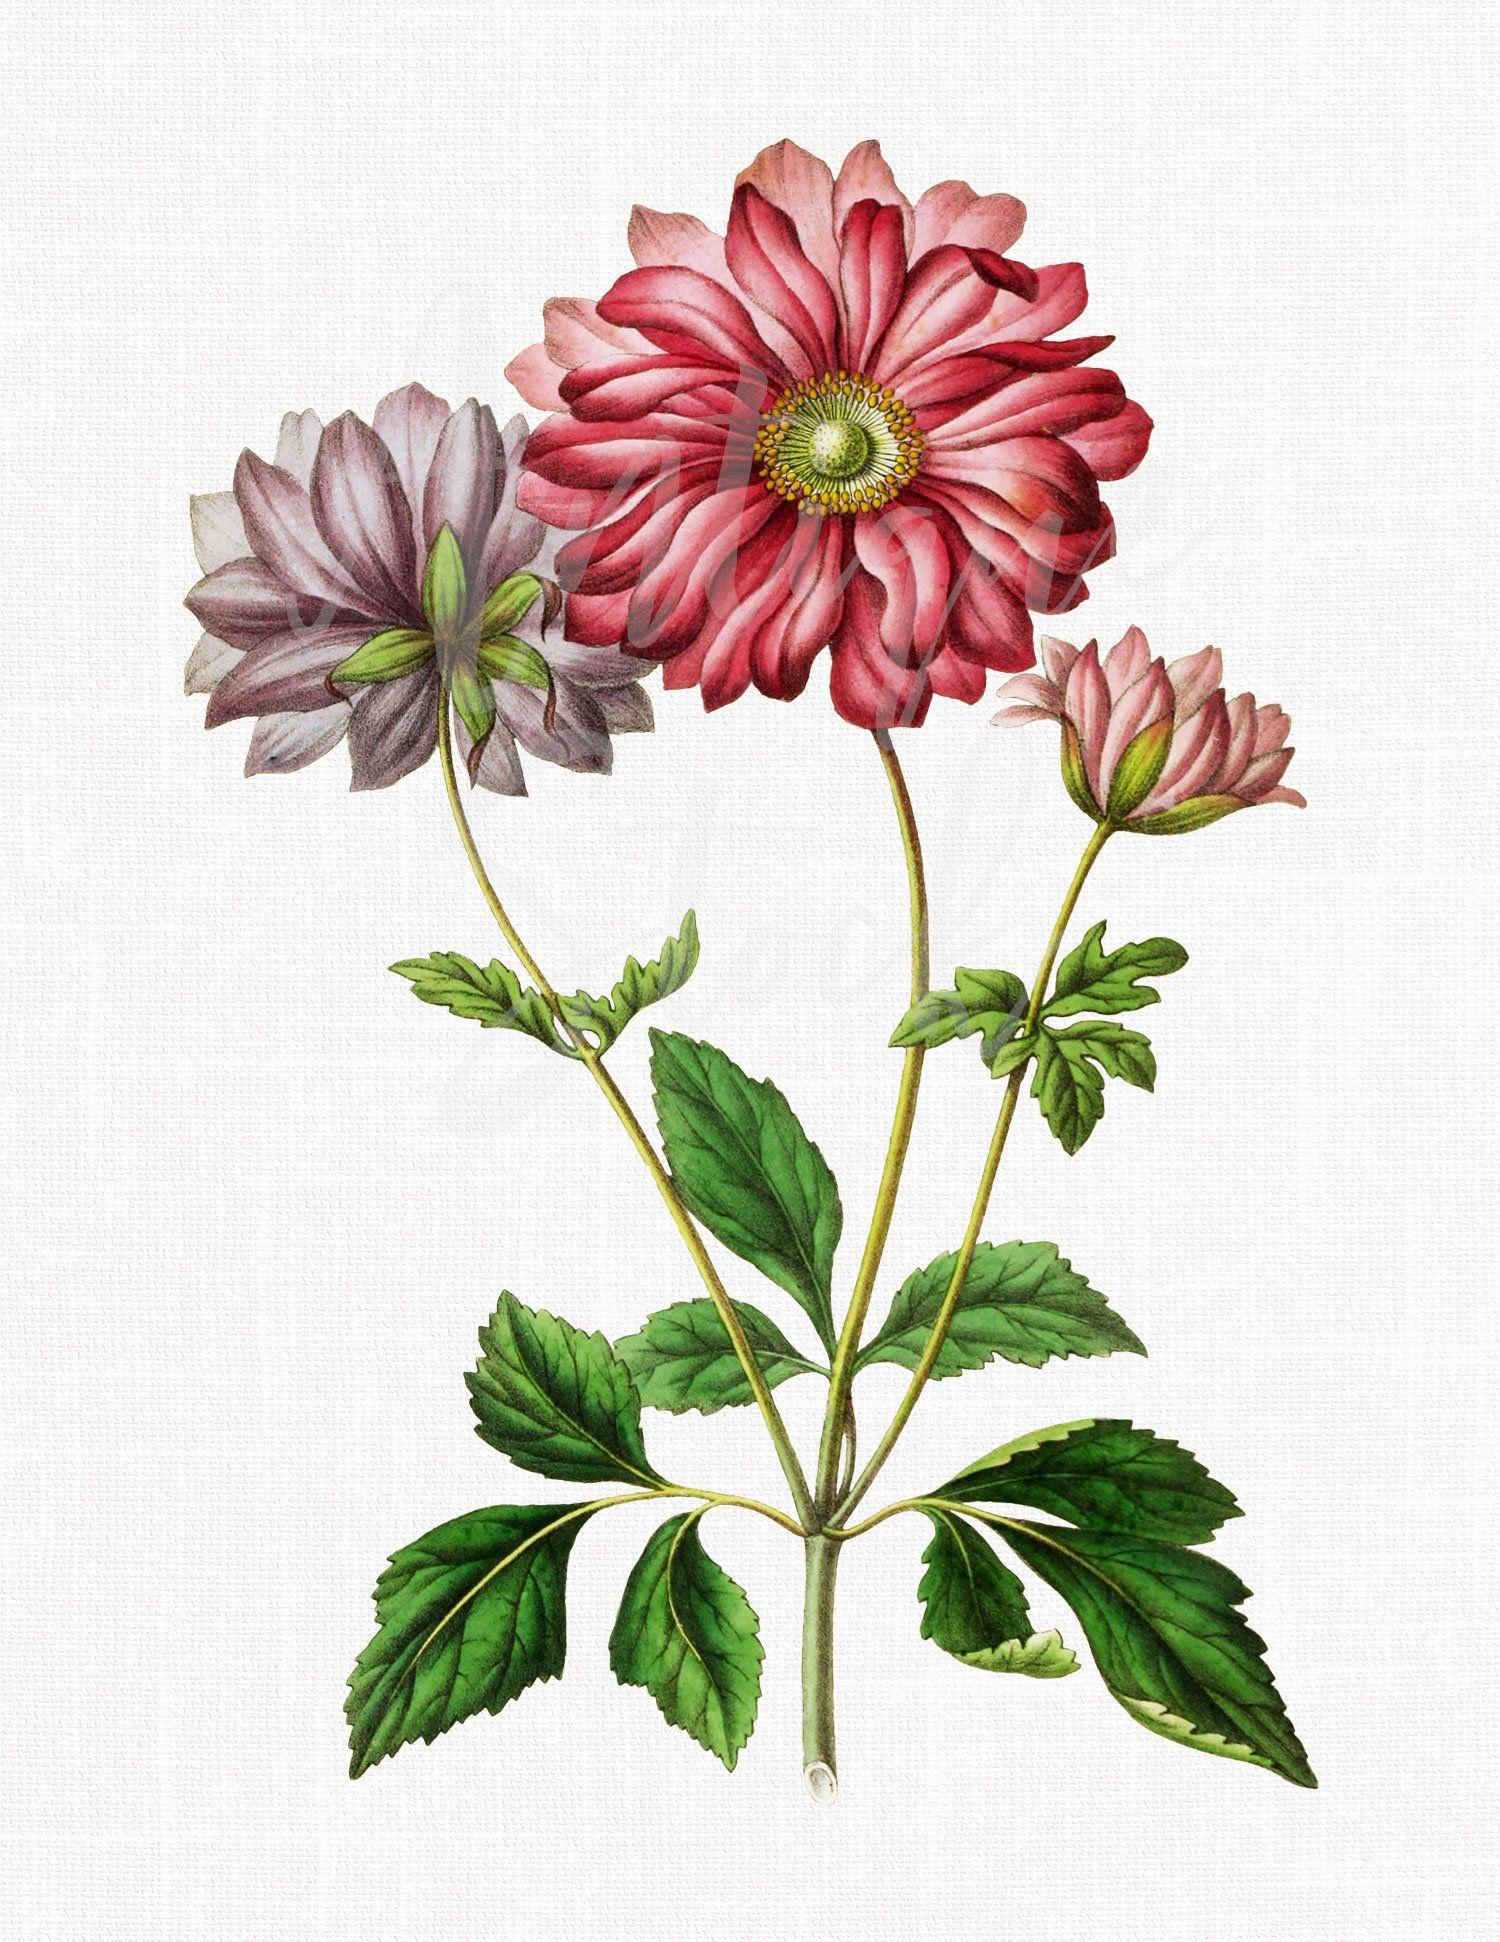 Watercolor Png Flower Anemone Scabiosa Botanical Etsy Botanical Illustration Digital Flowers Create Wedding Invitations